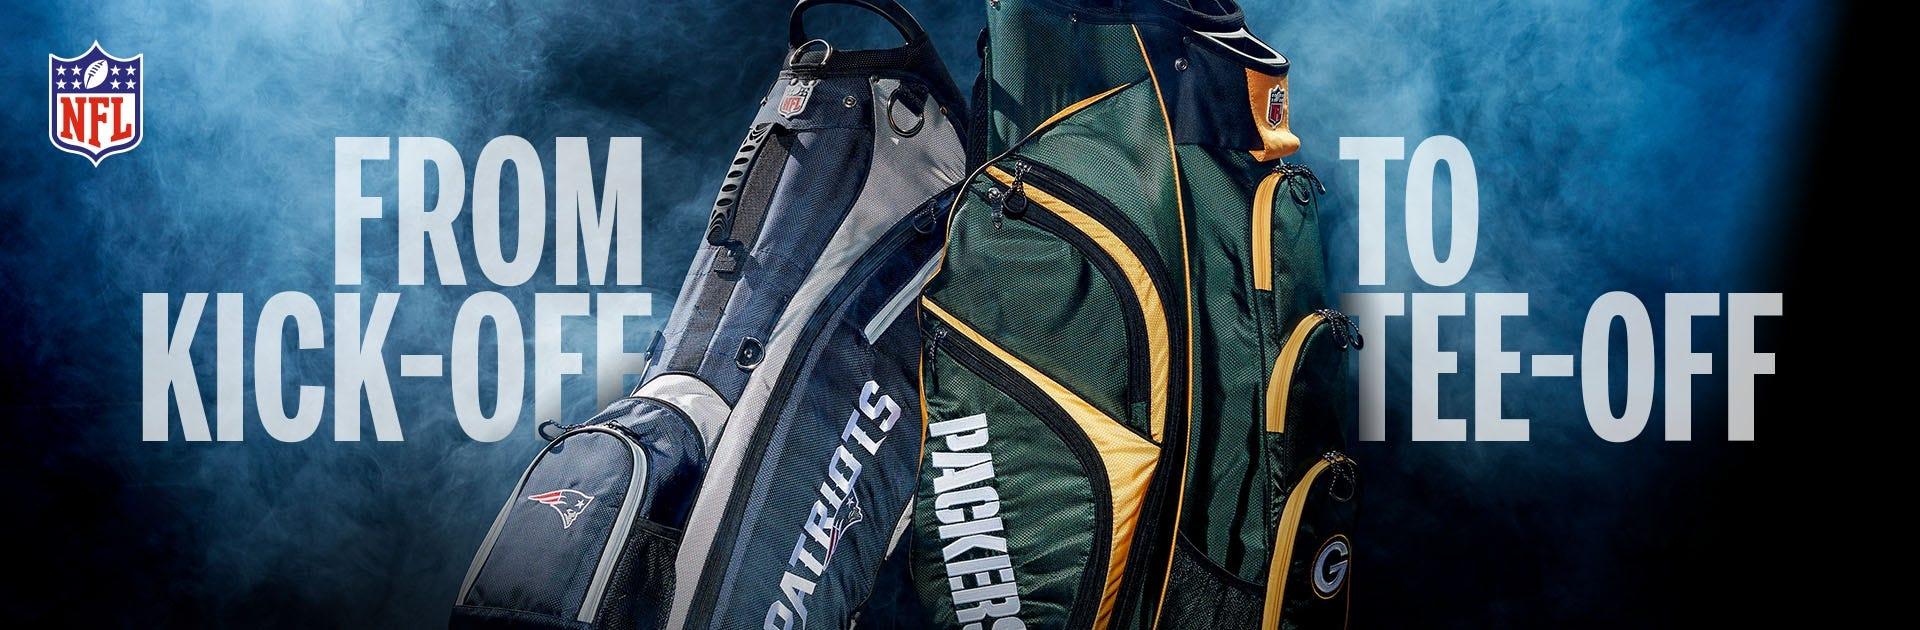 d20ebecc4 NFL Golf Bags